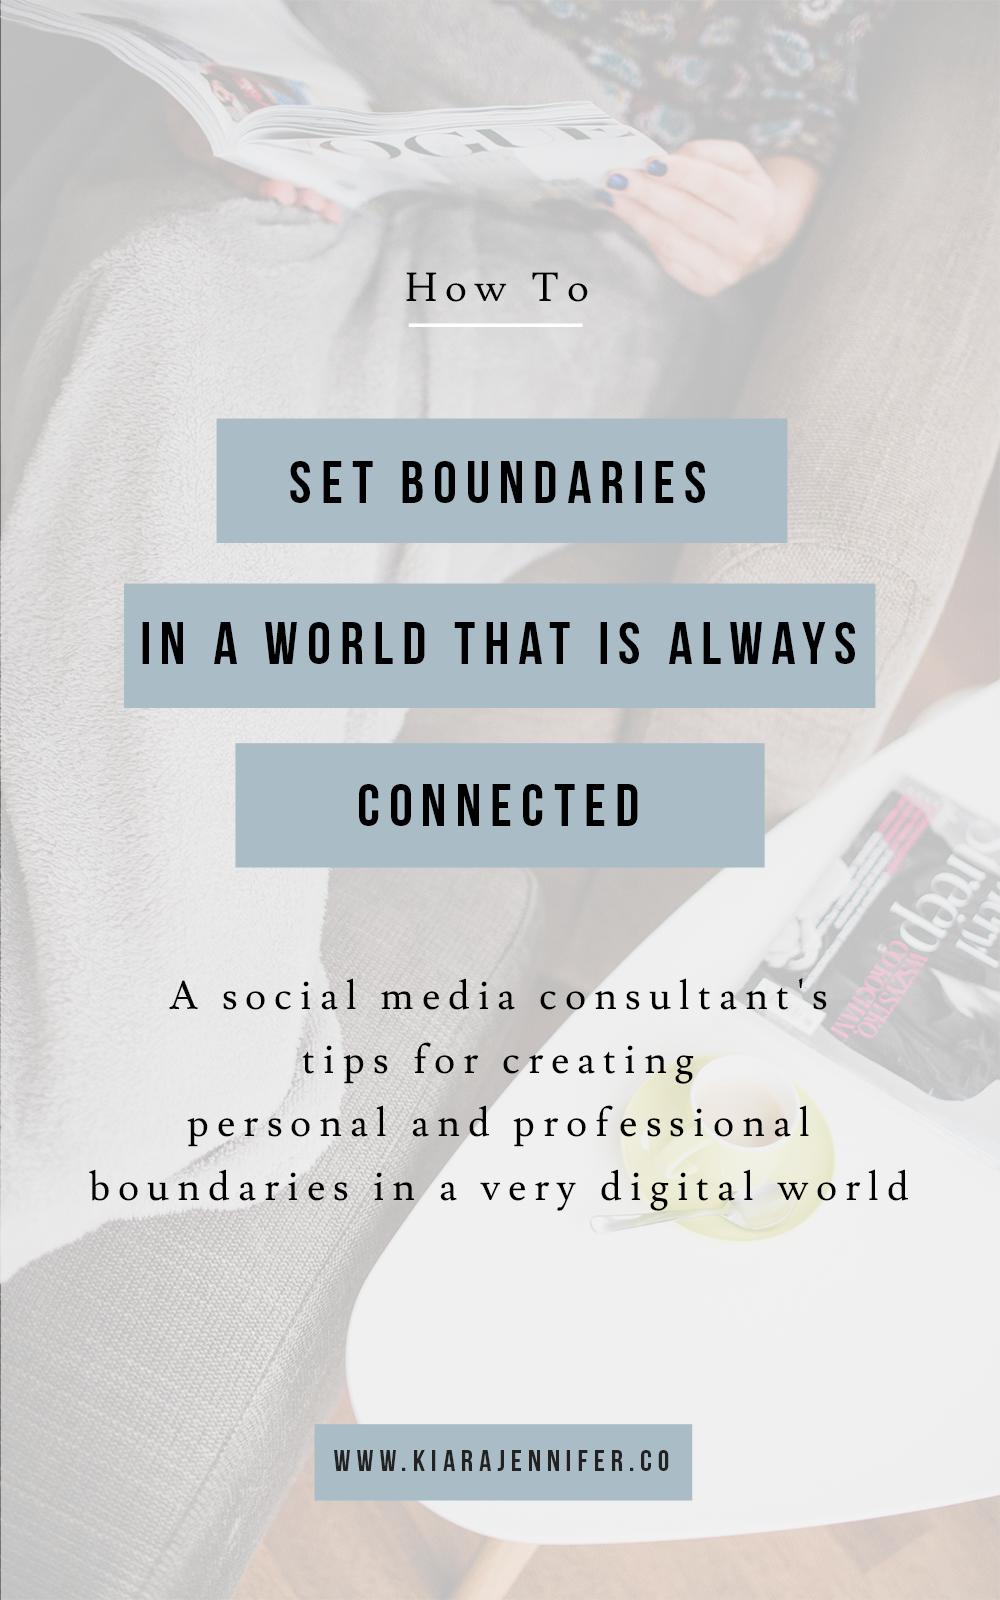 Setting Boundaries as an Entrepreneur   boundaries in a digital world   personal and professional boundary setting   social media marketing   digital public relations   kiara jennifer and co